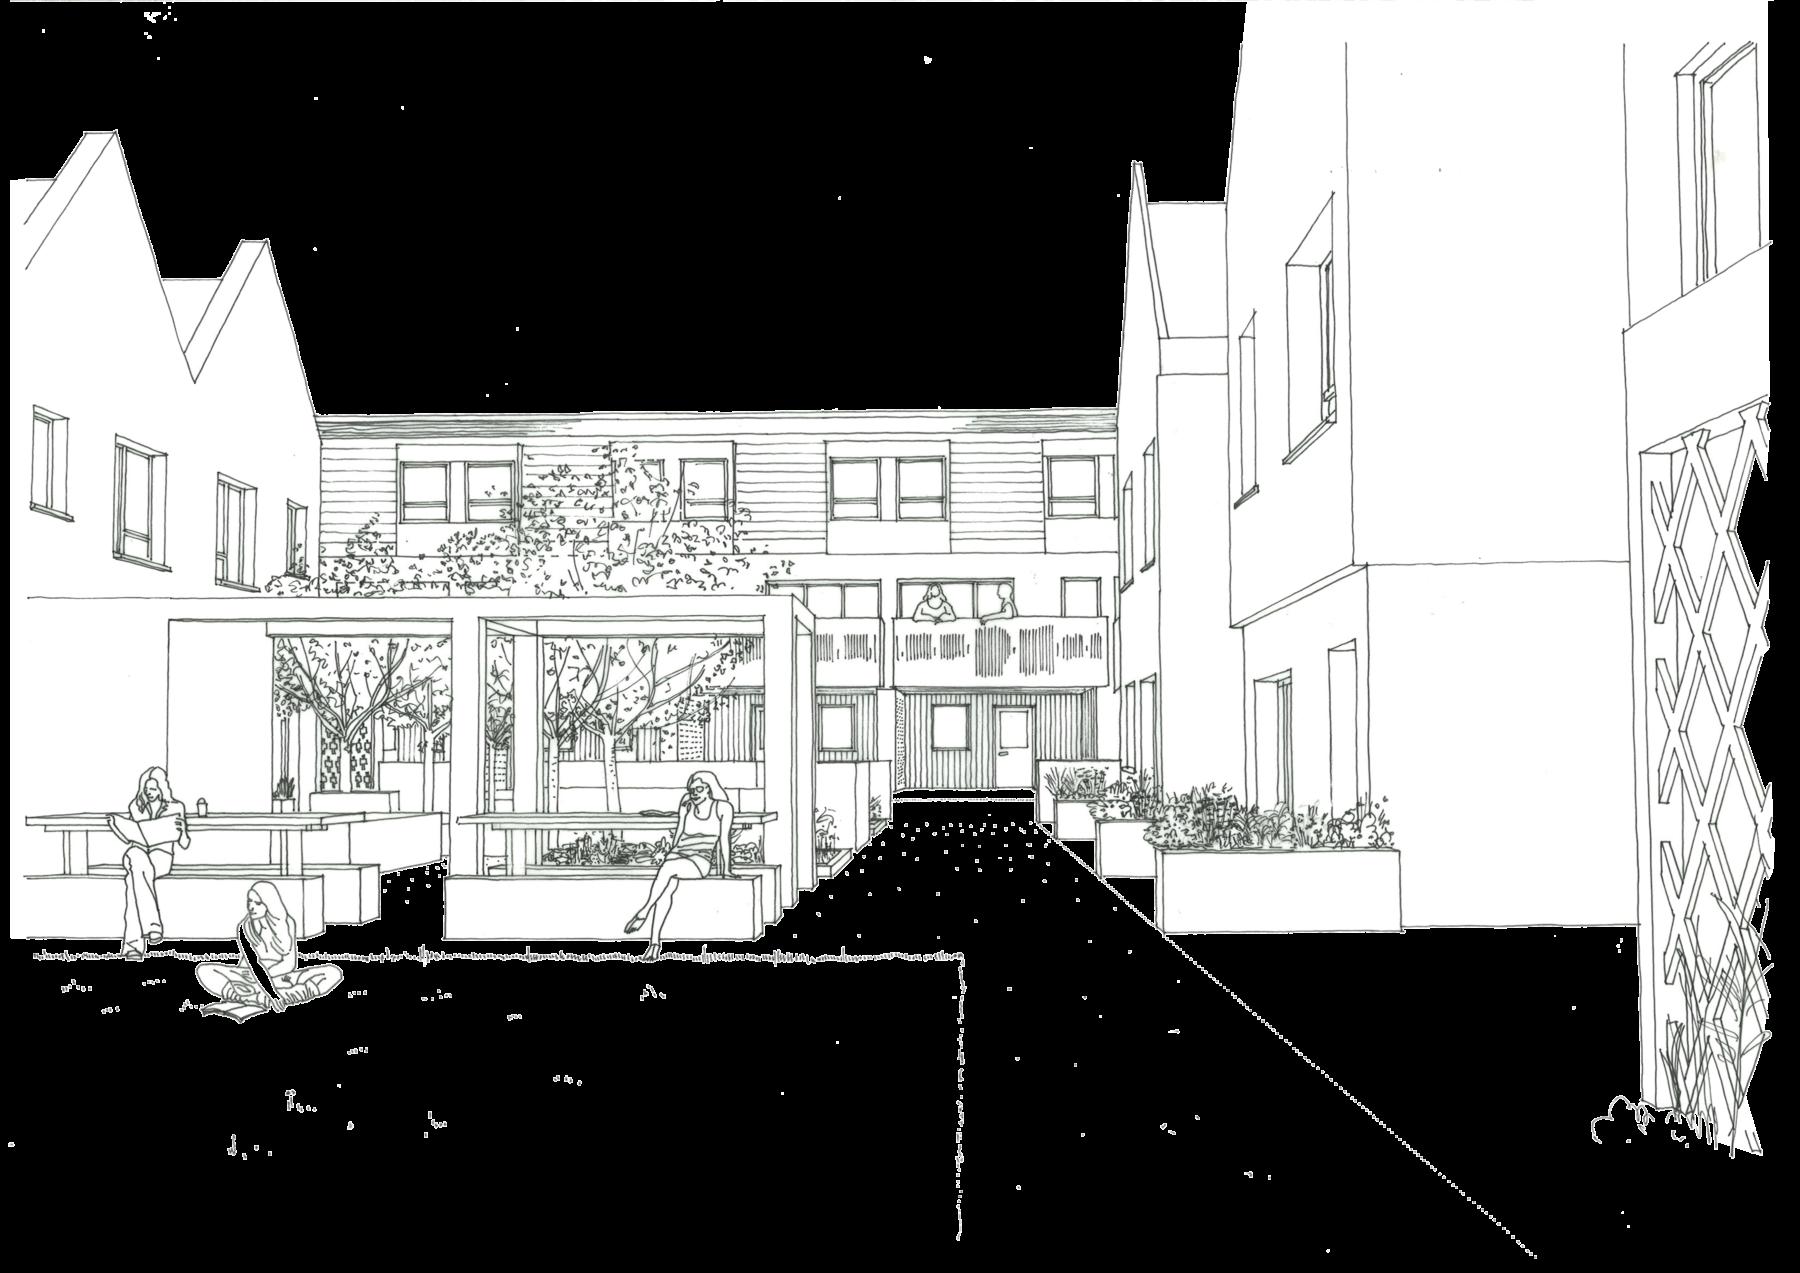 Sarah-Wigglesworth-Architects NWC courtyard-view2 3600